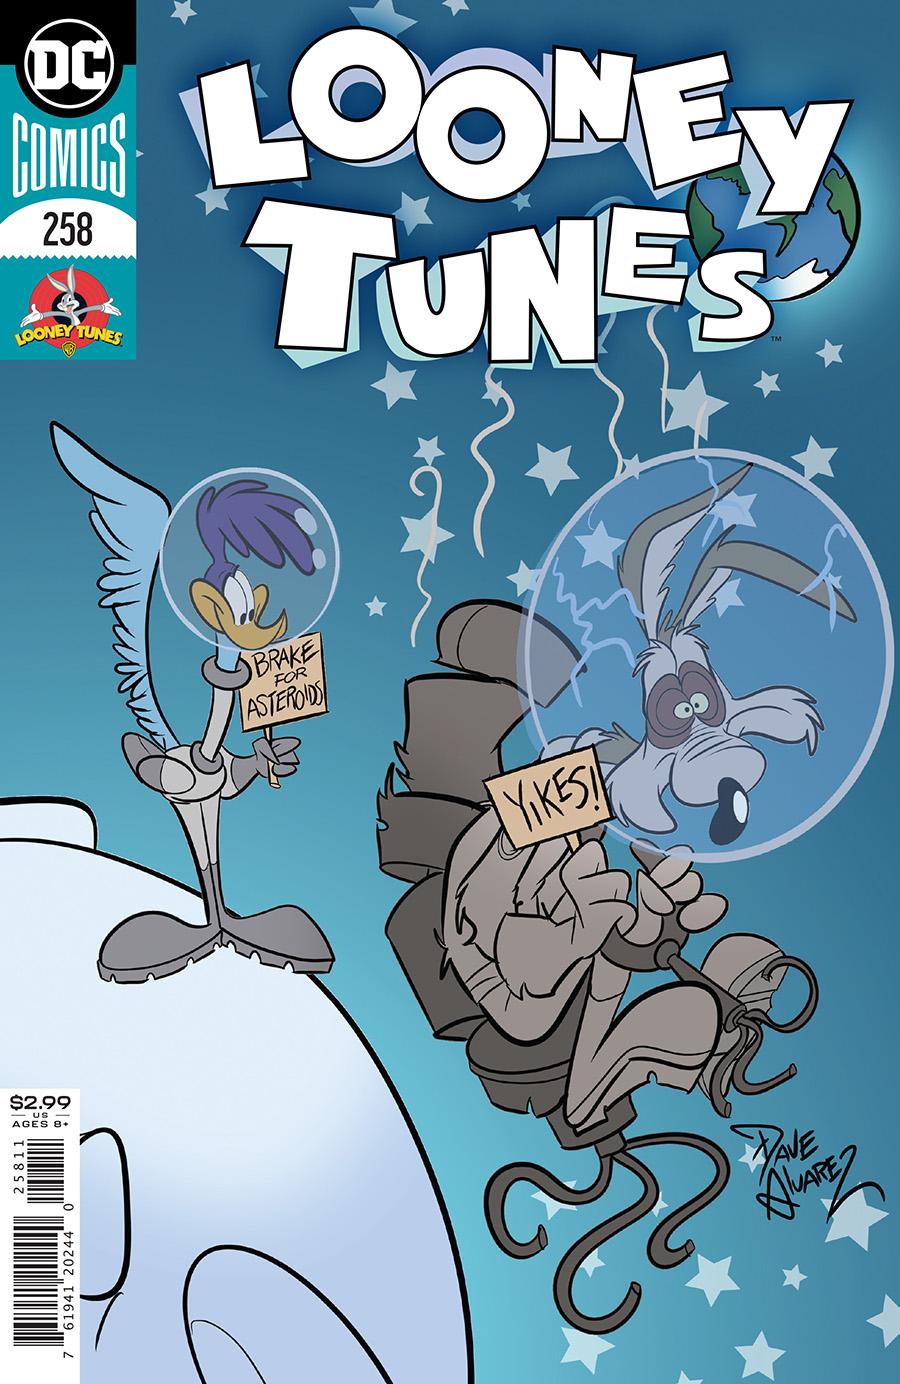 Looney Tunes Vol 3 #258